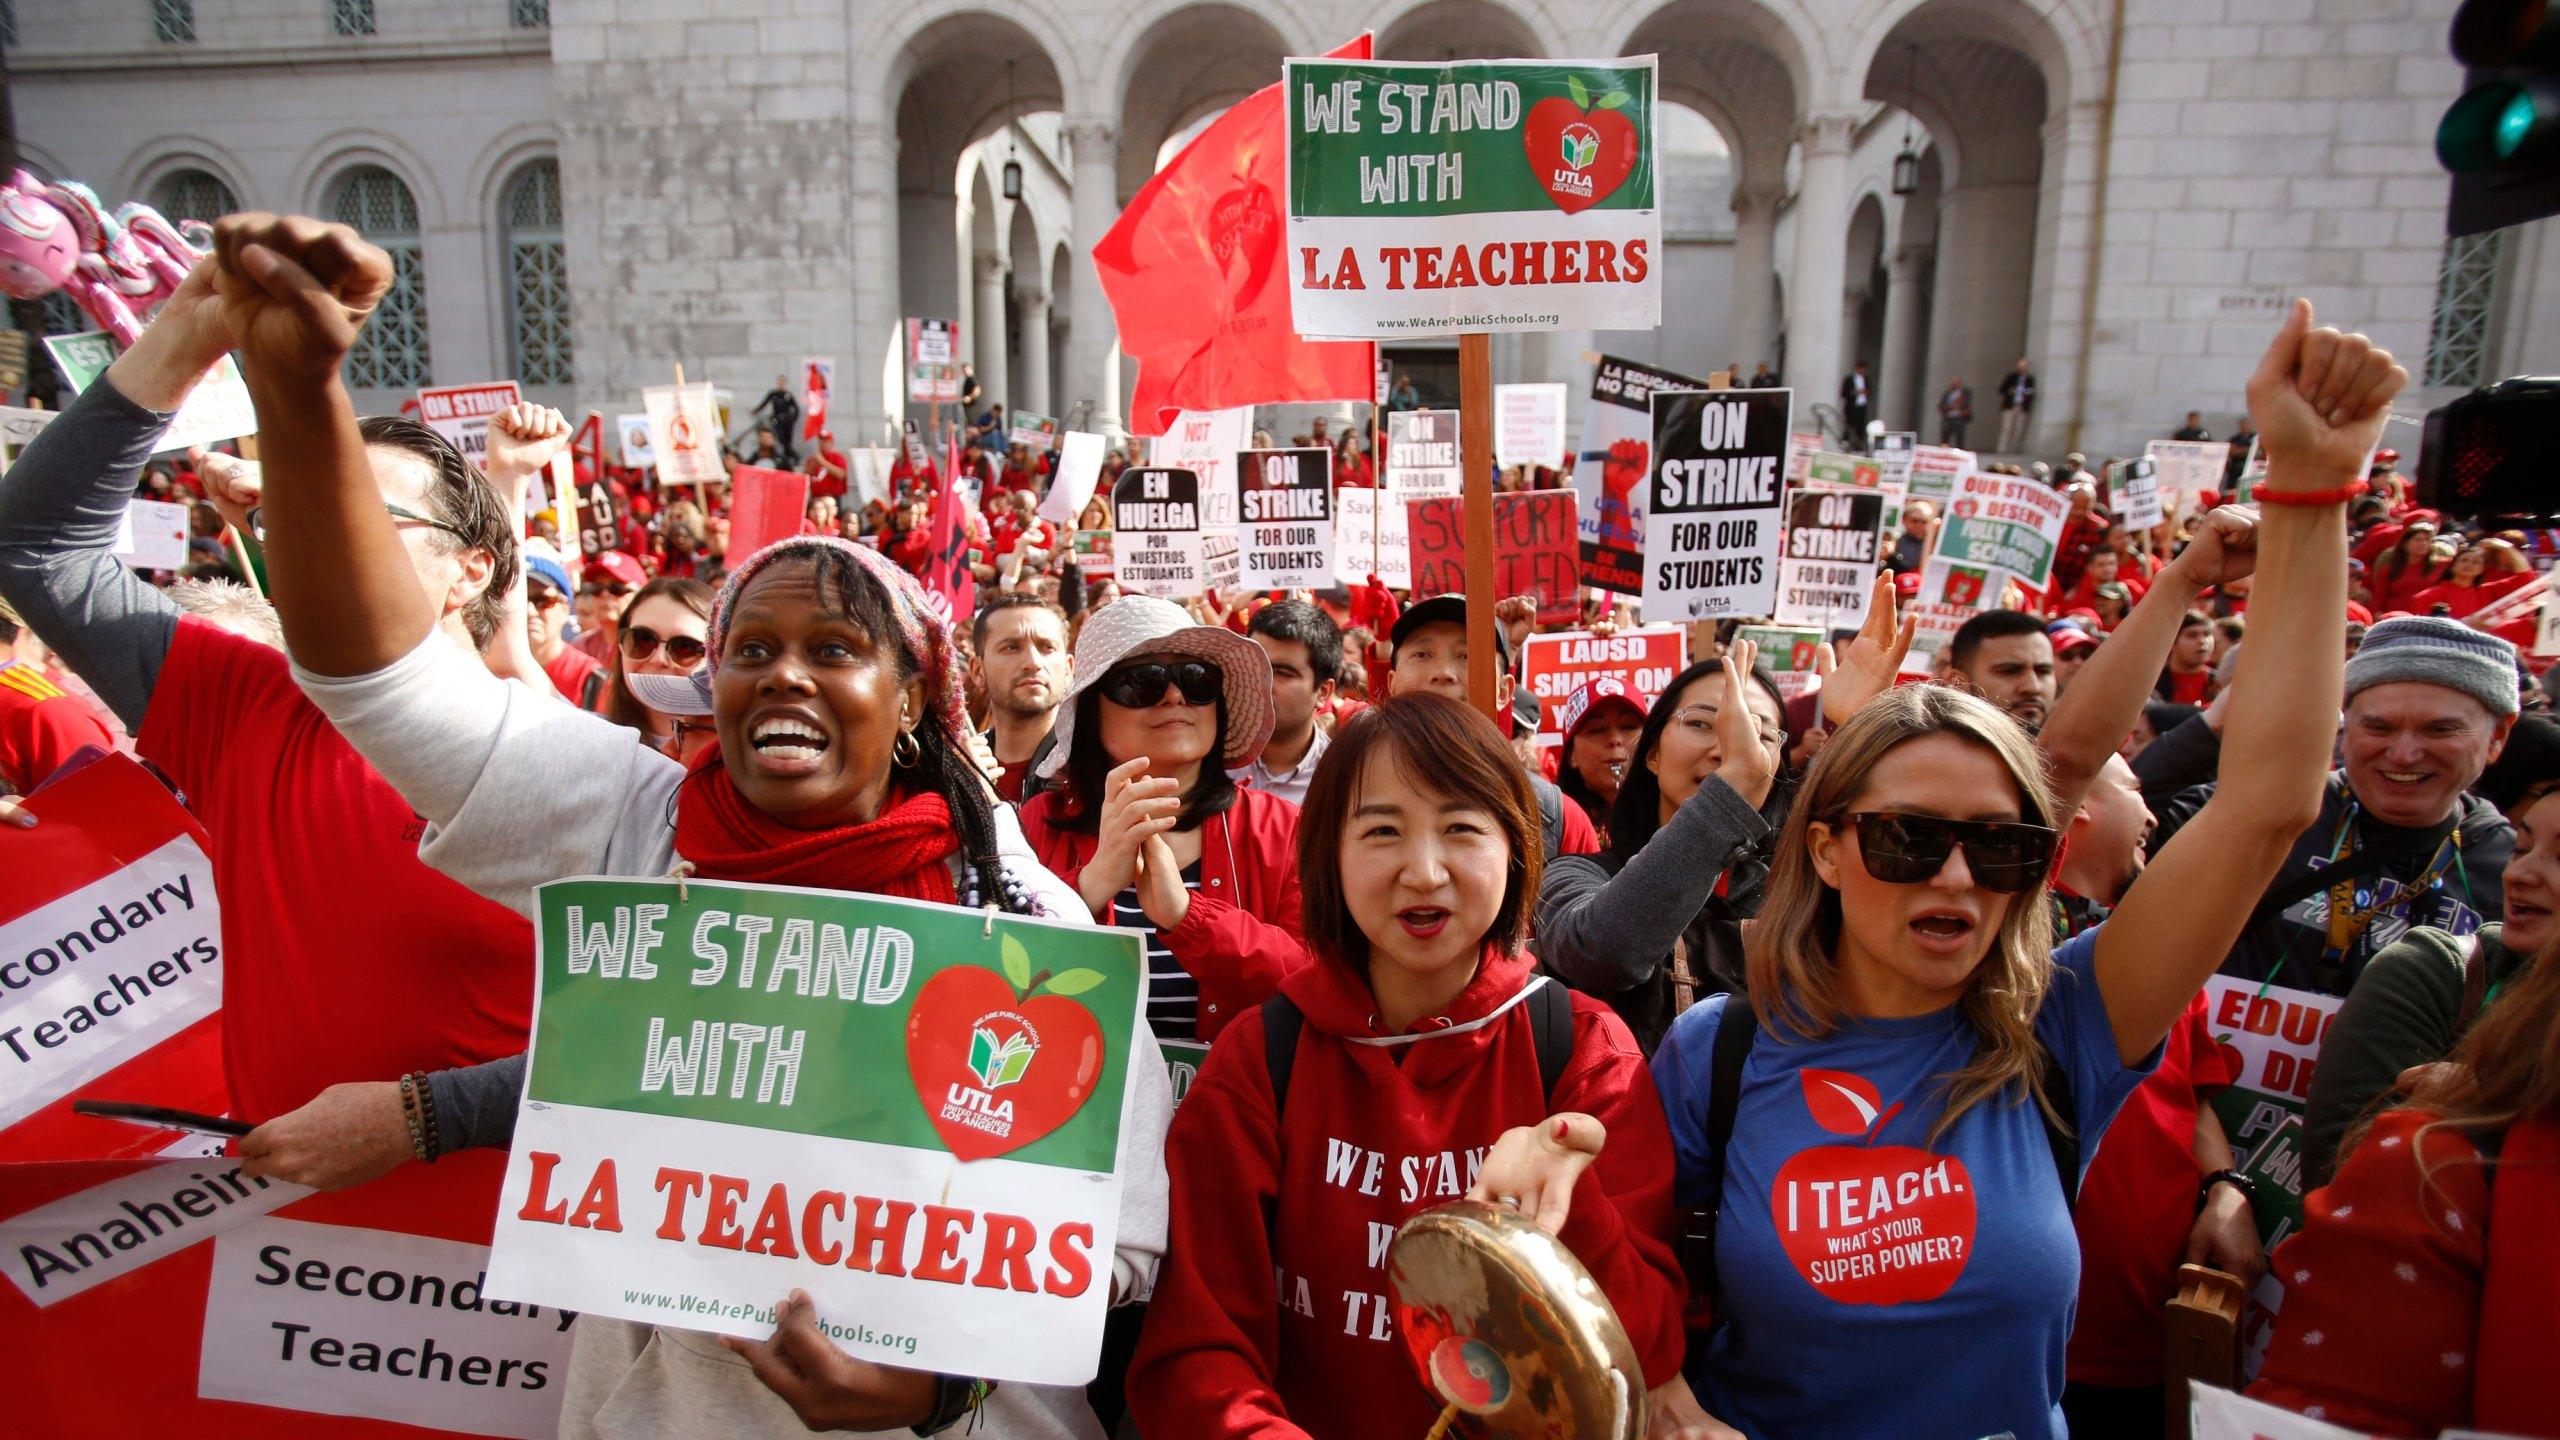 LA-Teachers-strike_1548185539356.jpg